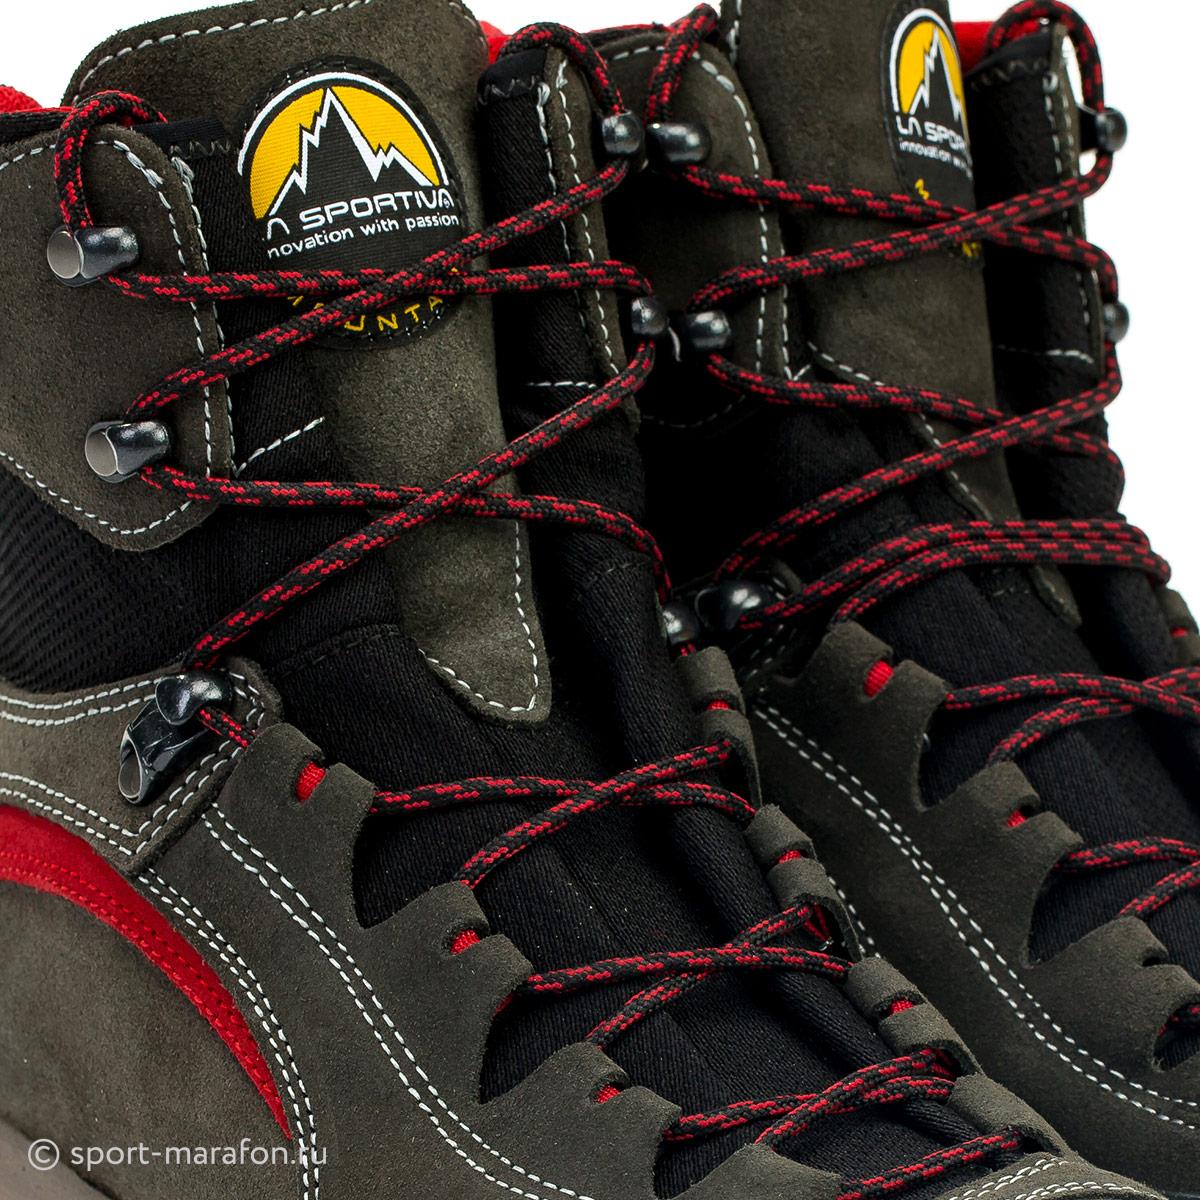 9e228d1c Ботинки La Sportiva Trango Trek Micro Evo Gtx Anthracite/Red - Фото 8  большая